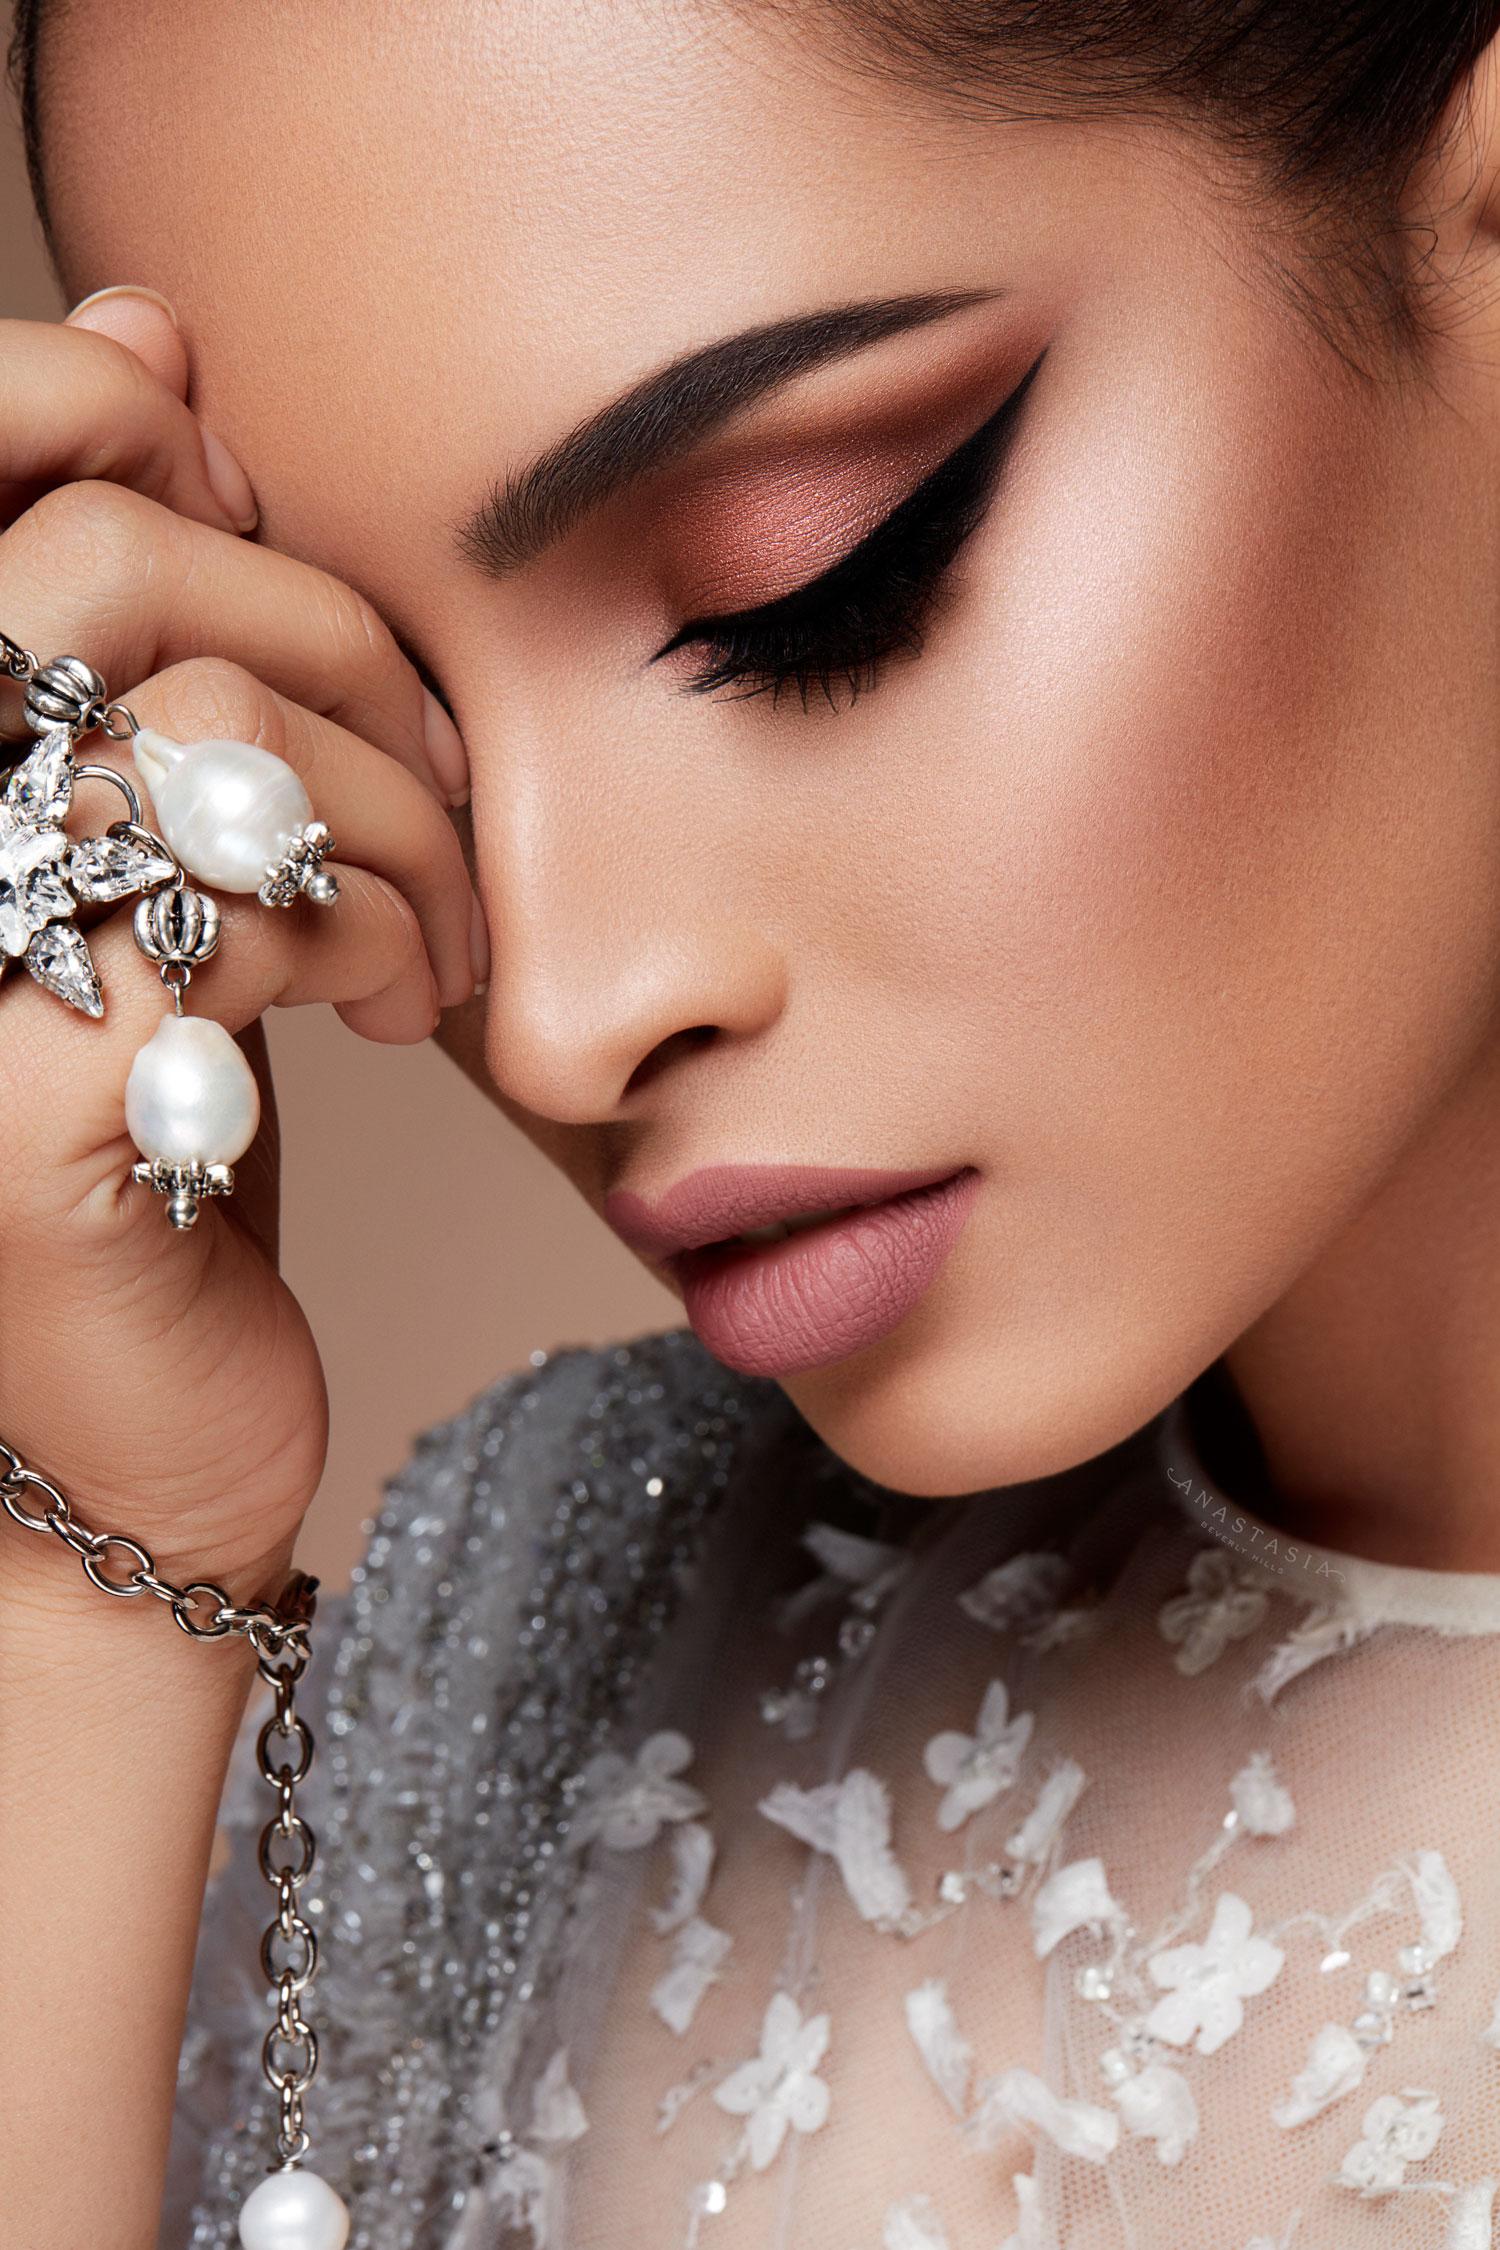 Anastasia Beverly Hills Liquid Lipstick Swatches T: Anastasia Beverly Hills Launches First Bridal-Inspired